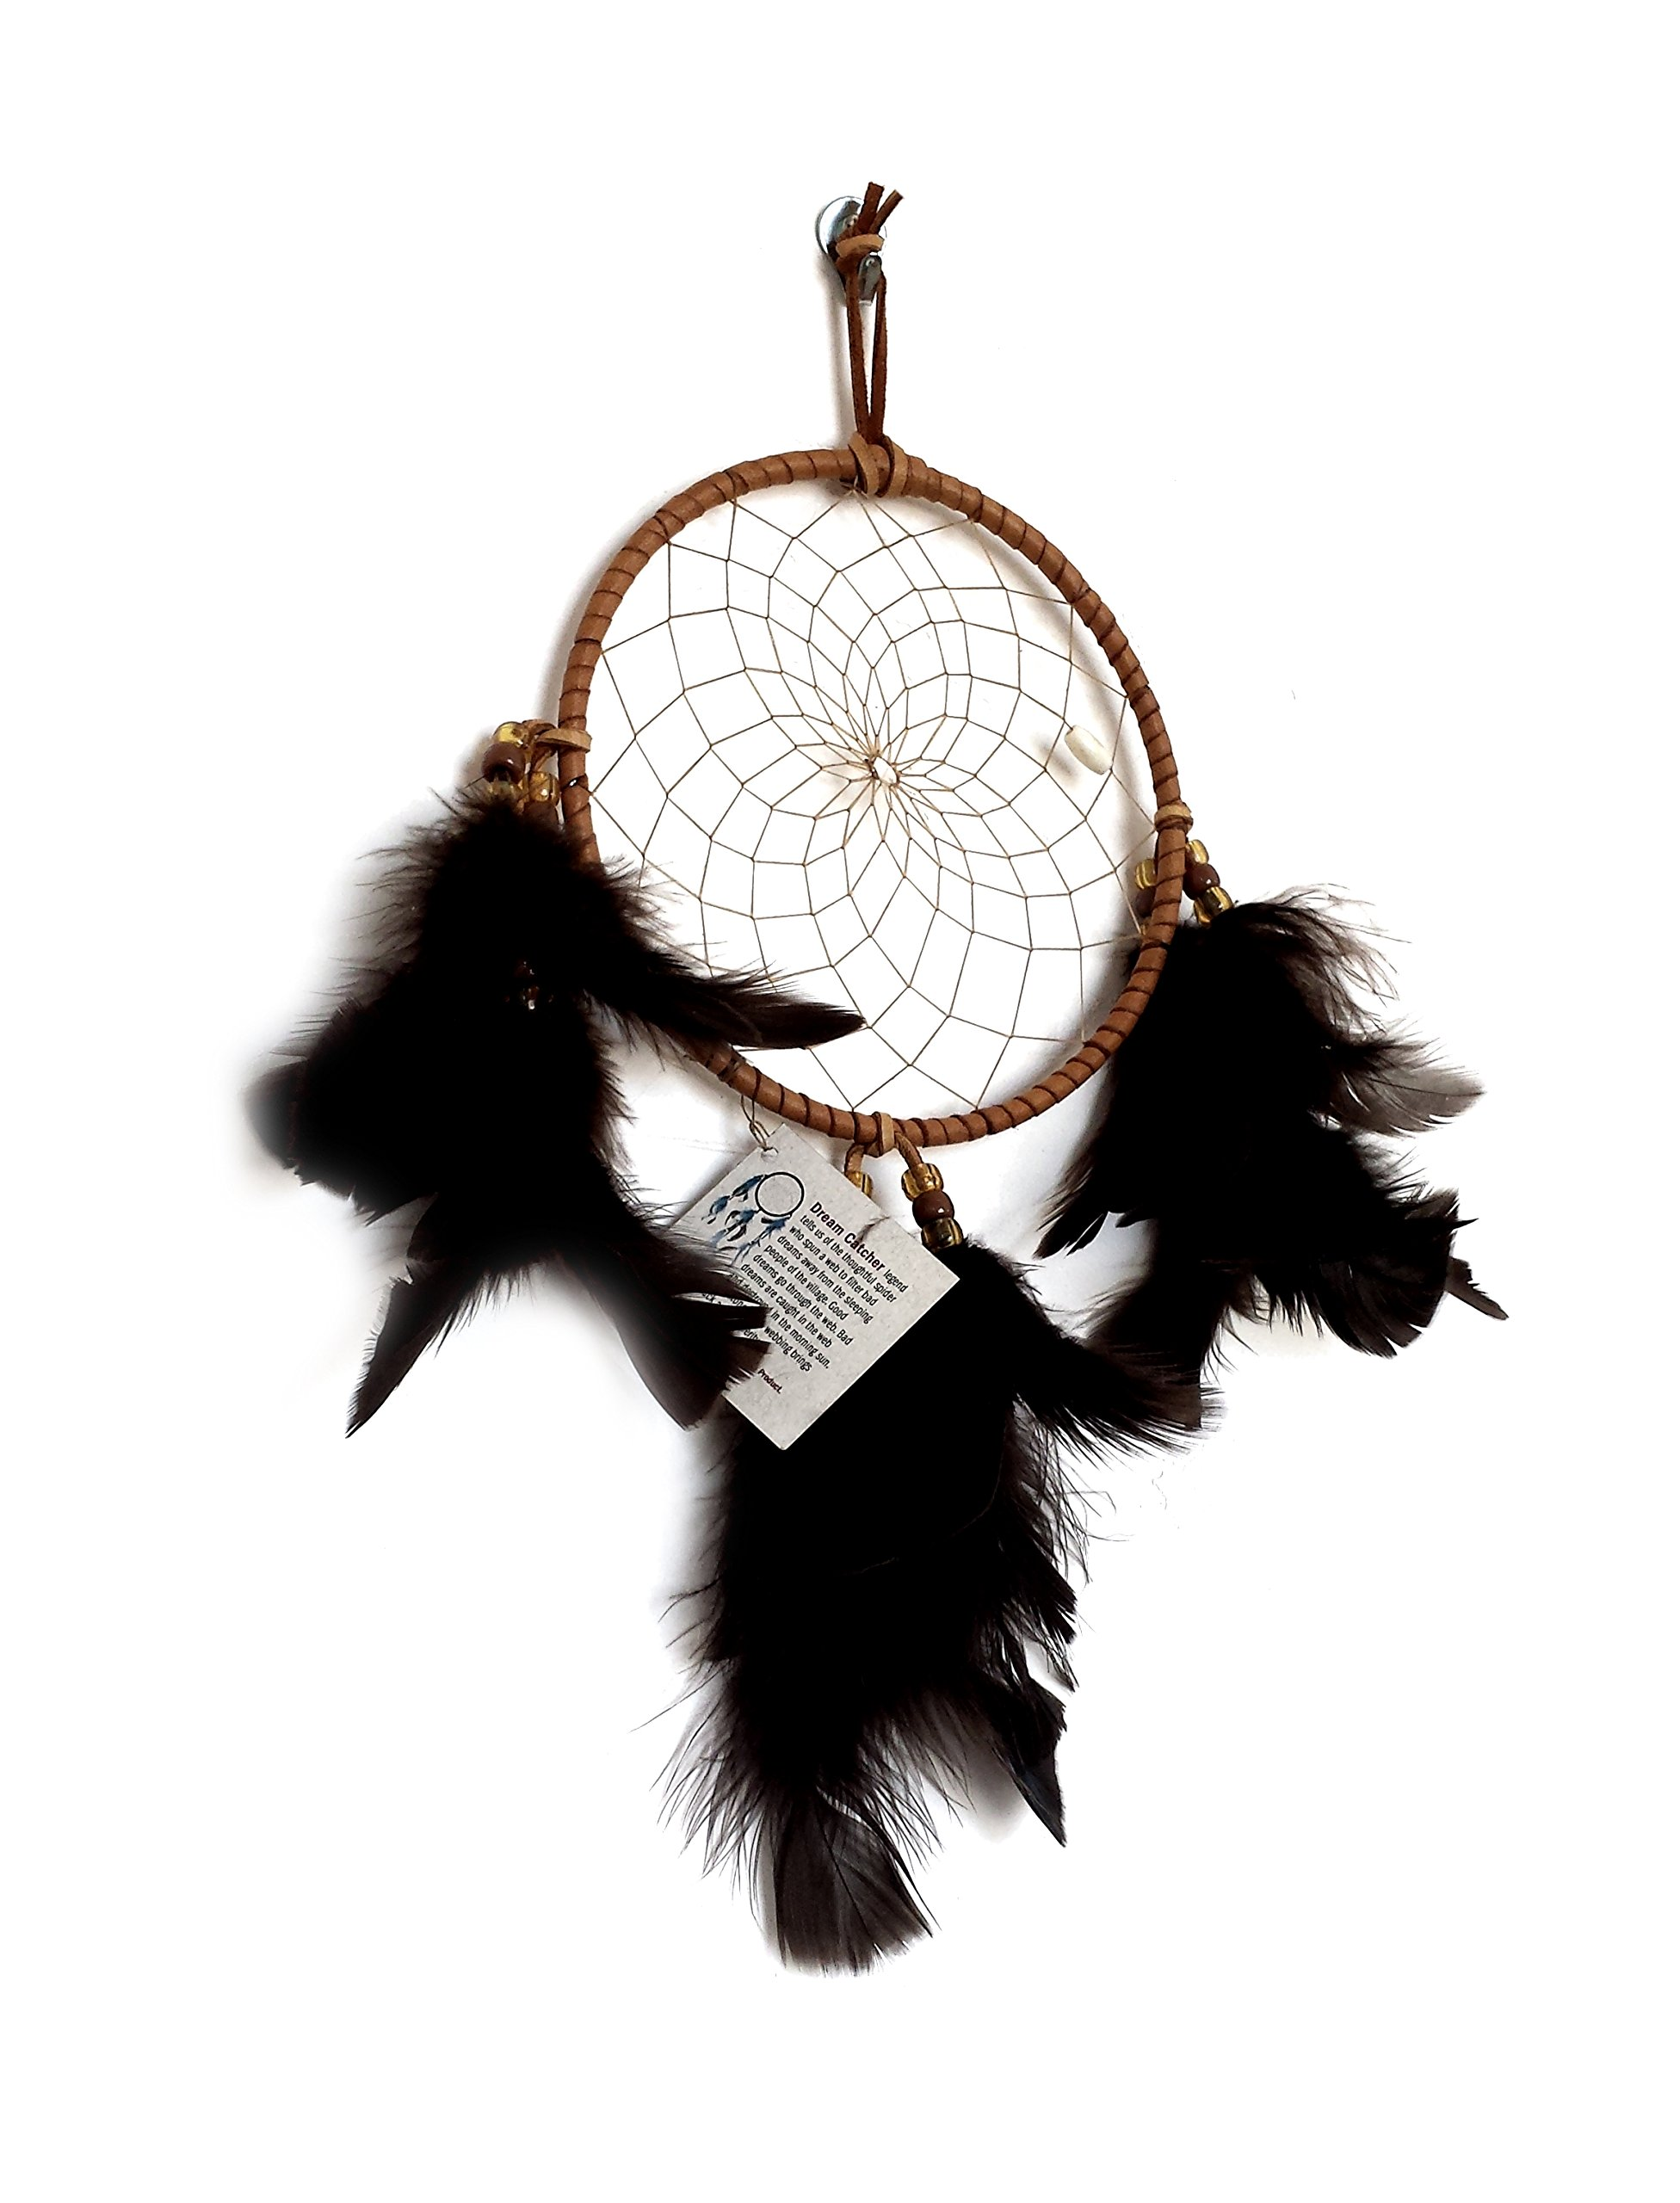 Dream Catcher - Authentic 6 inch Medium Hand Made Native American Indian Cherokee Dreamcatcher